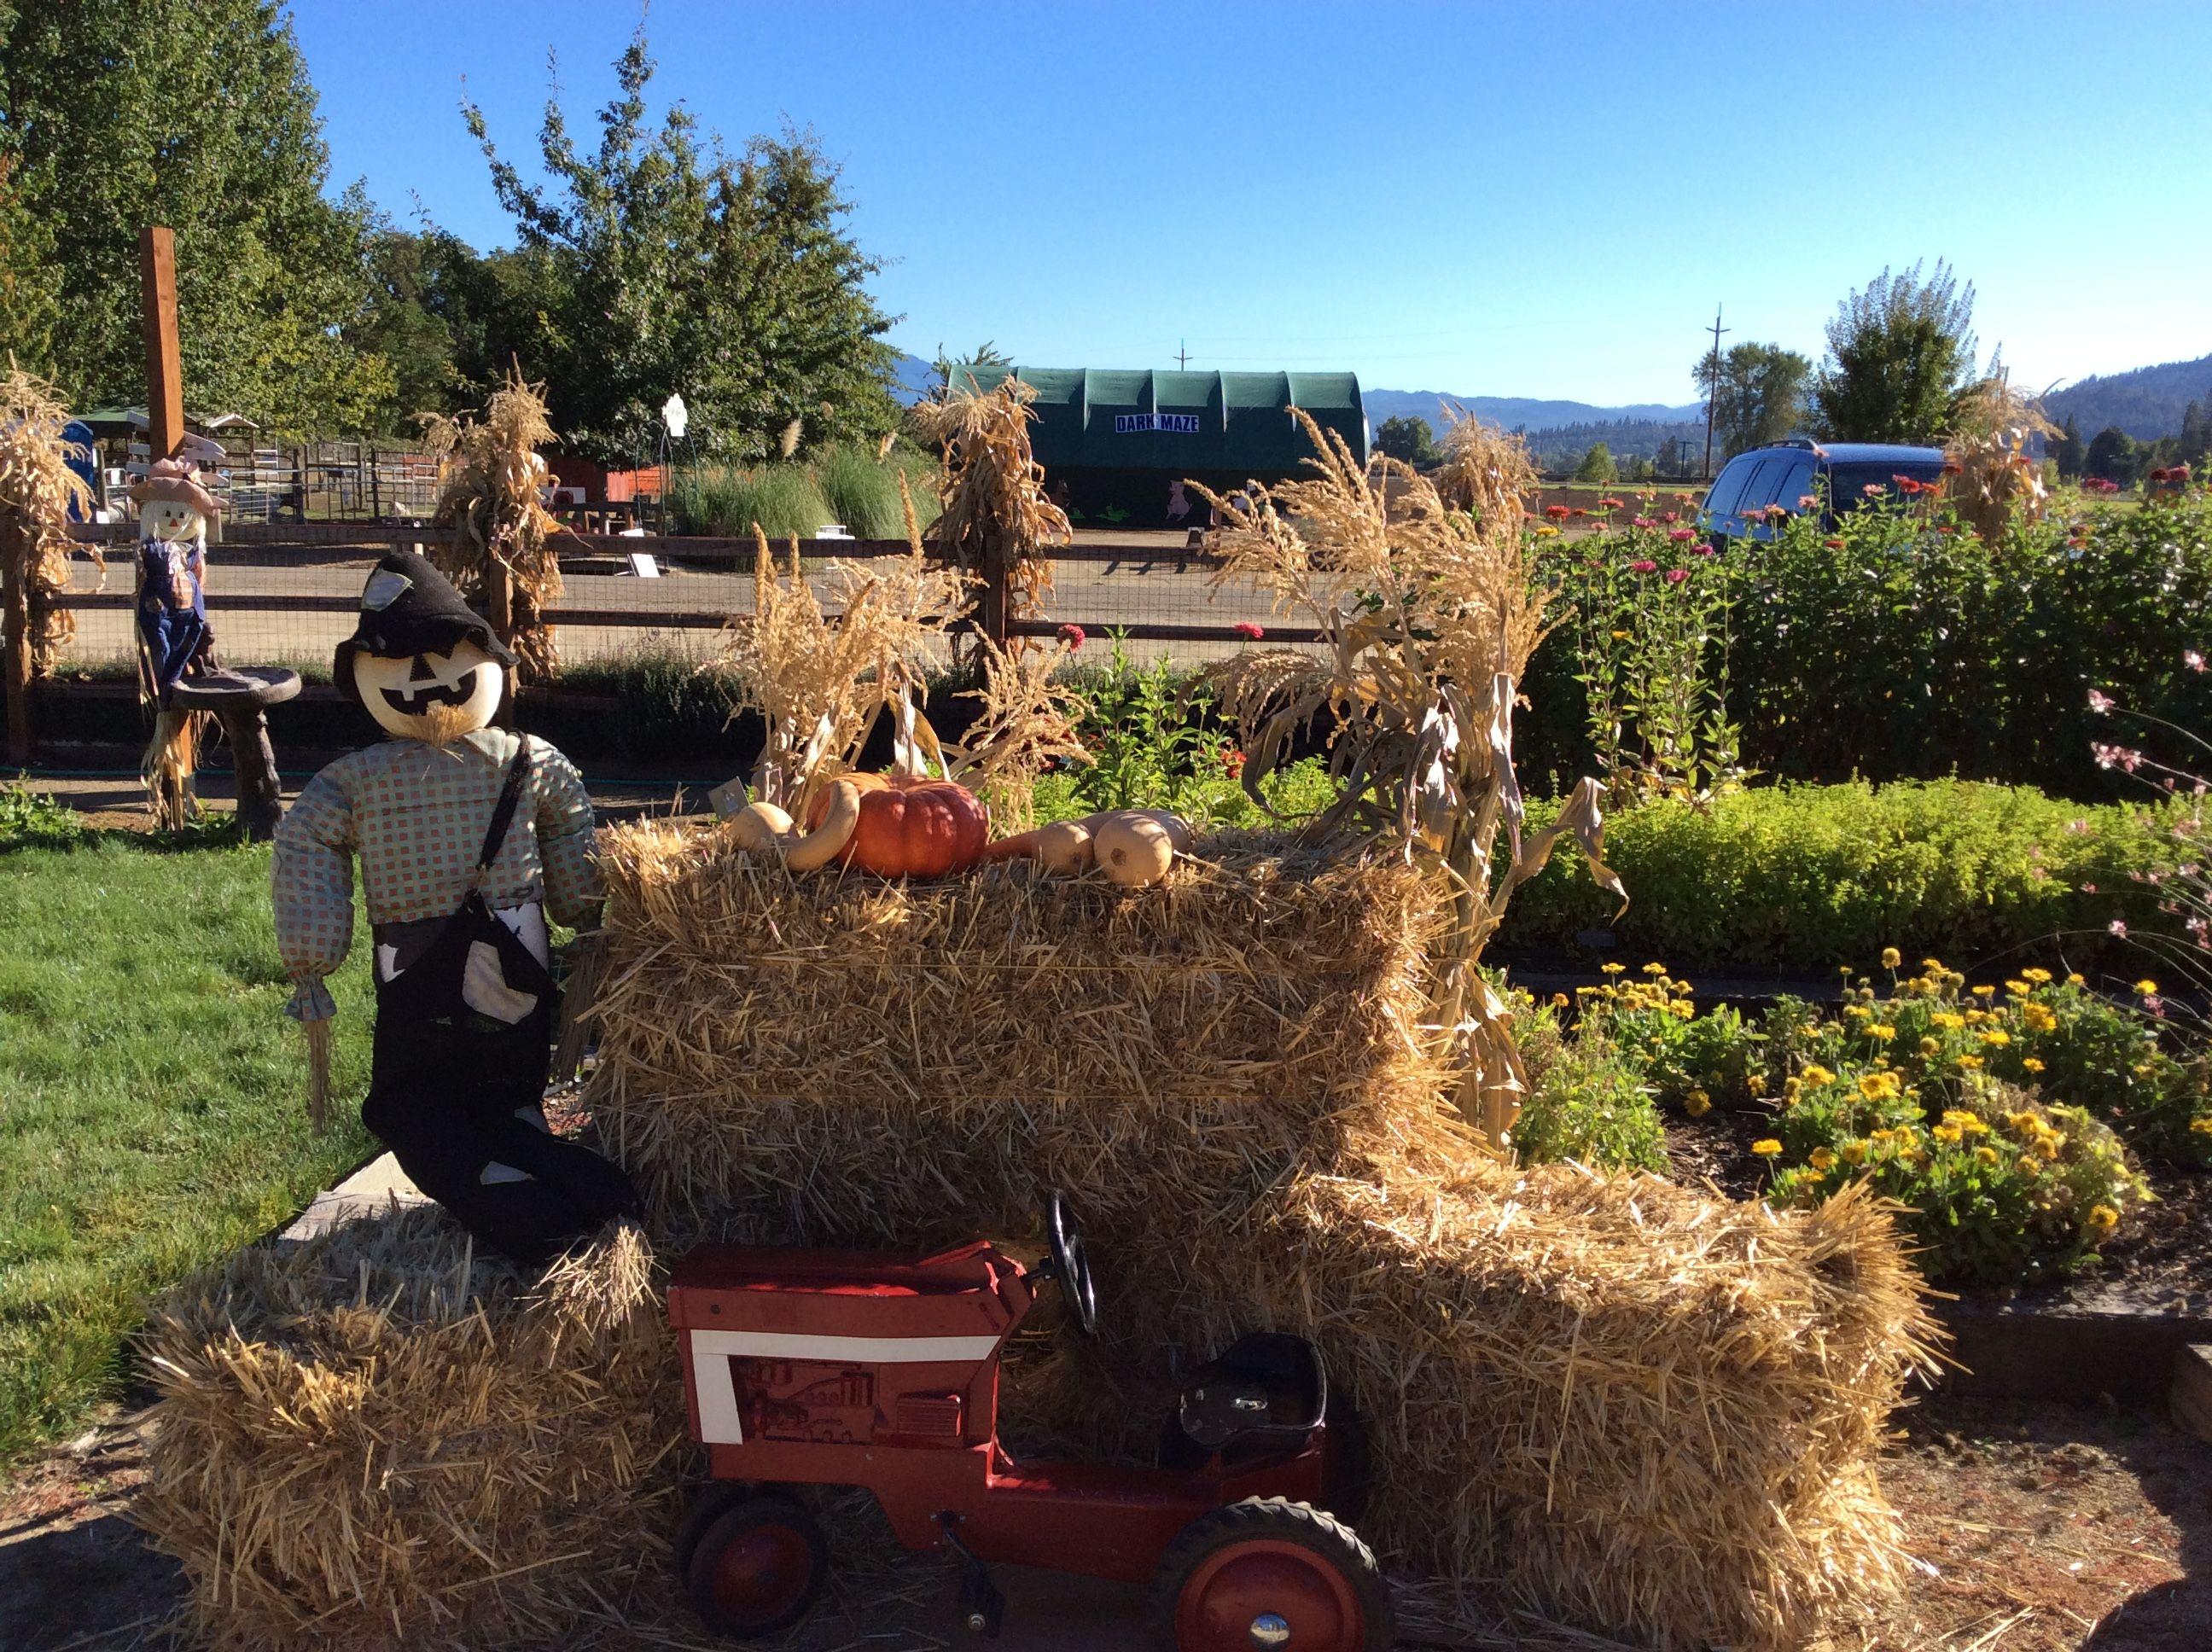 Seven Oaks Farms Central Point Oregon Windermere